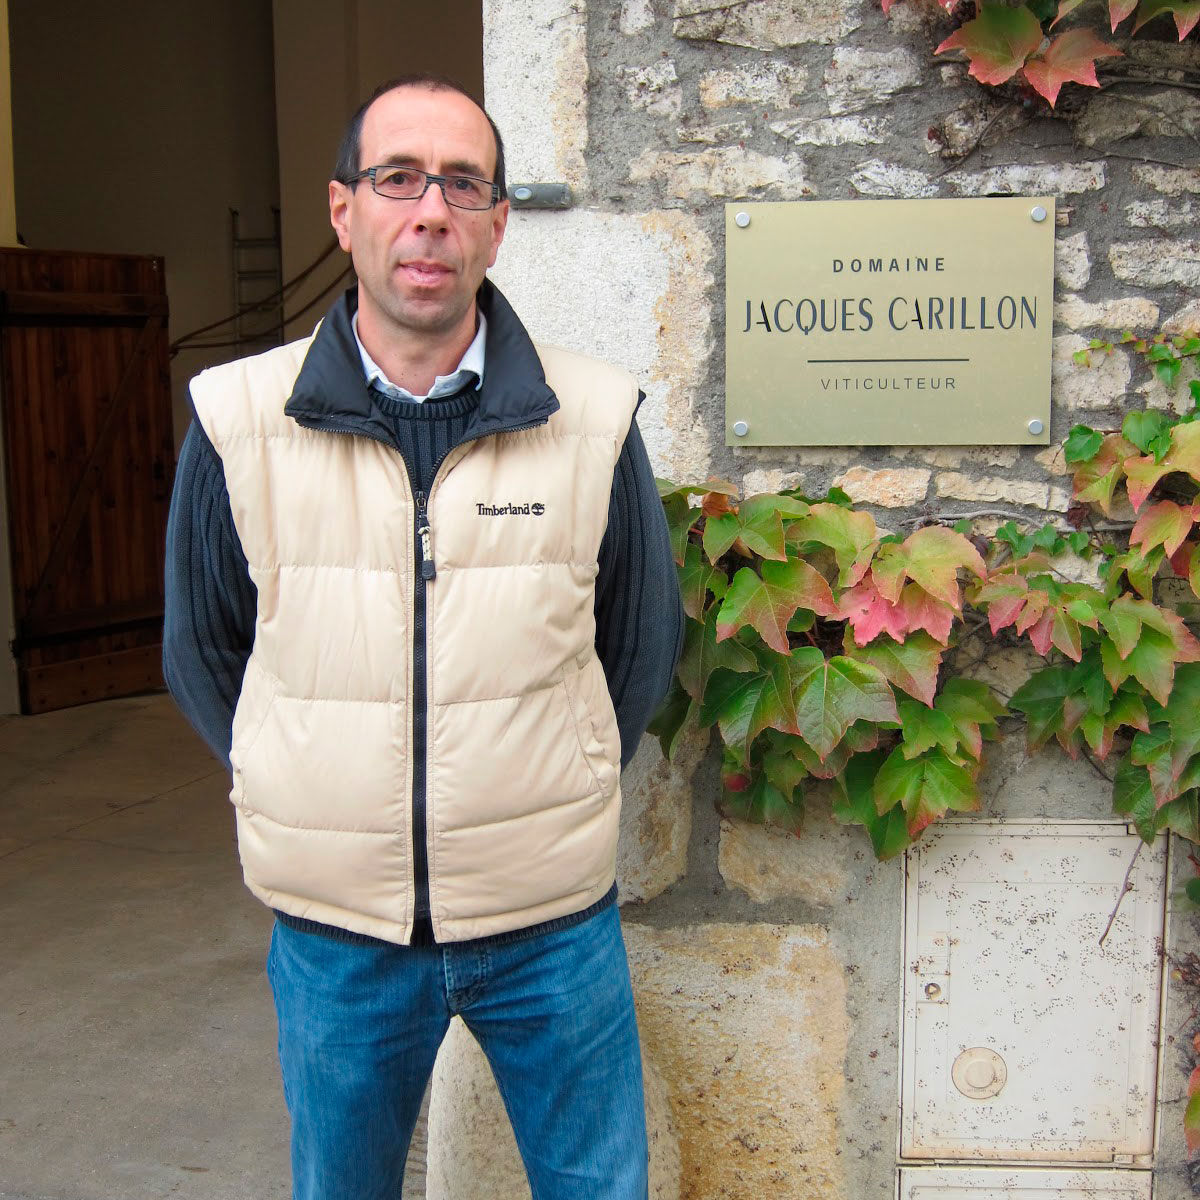 Jacques-Carillon